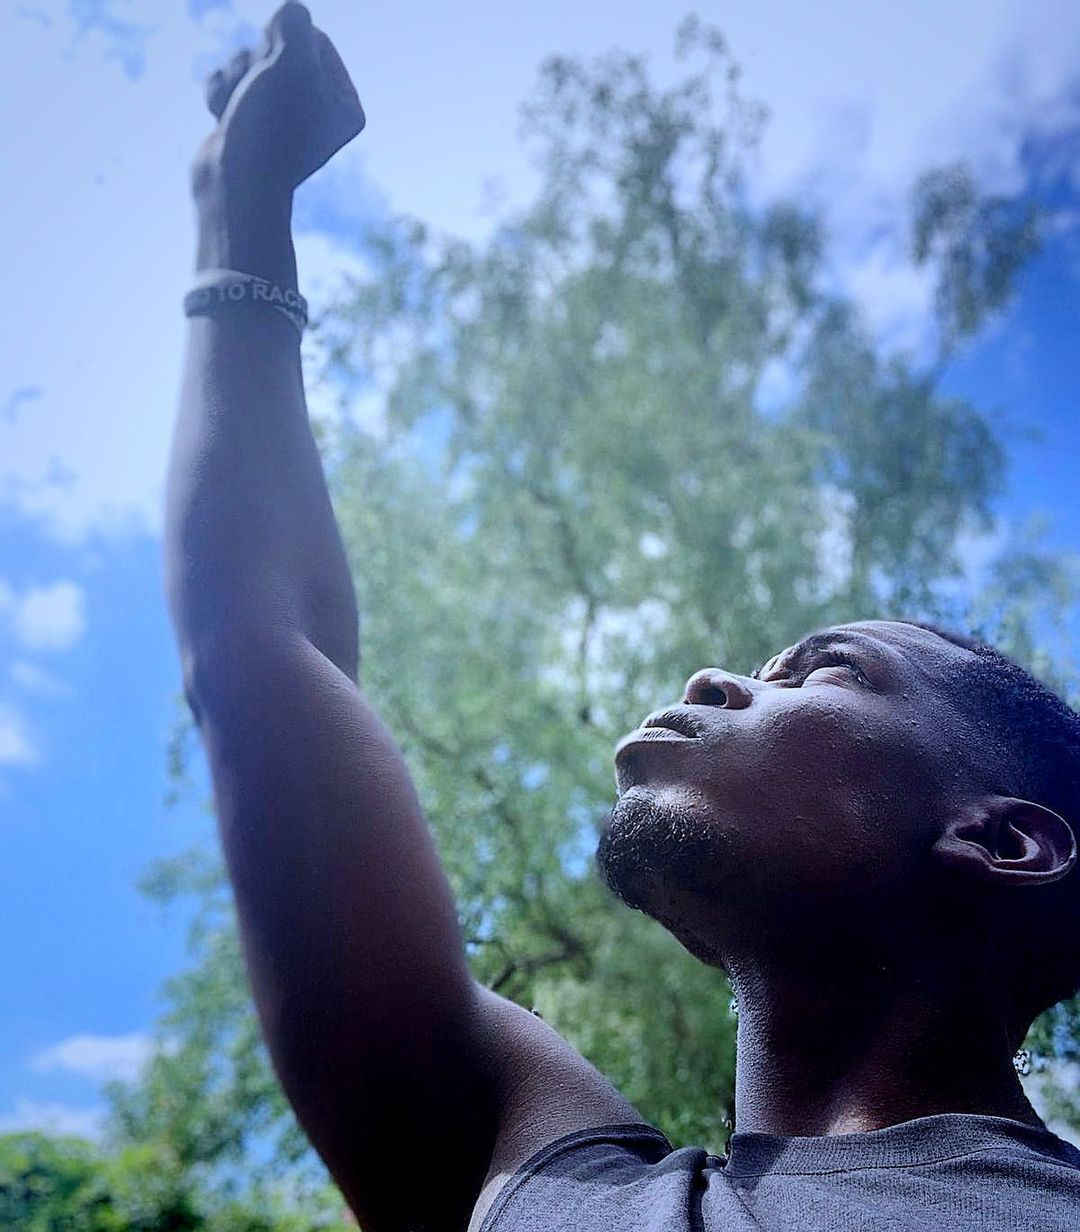 Paul Pogba atleta de futebol recebeu US$ 35,5 milhões (Foto: Instagram)